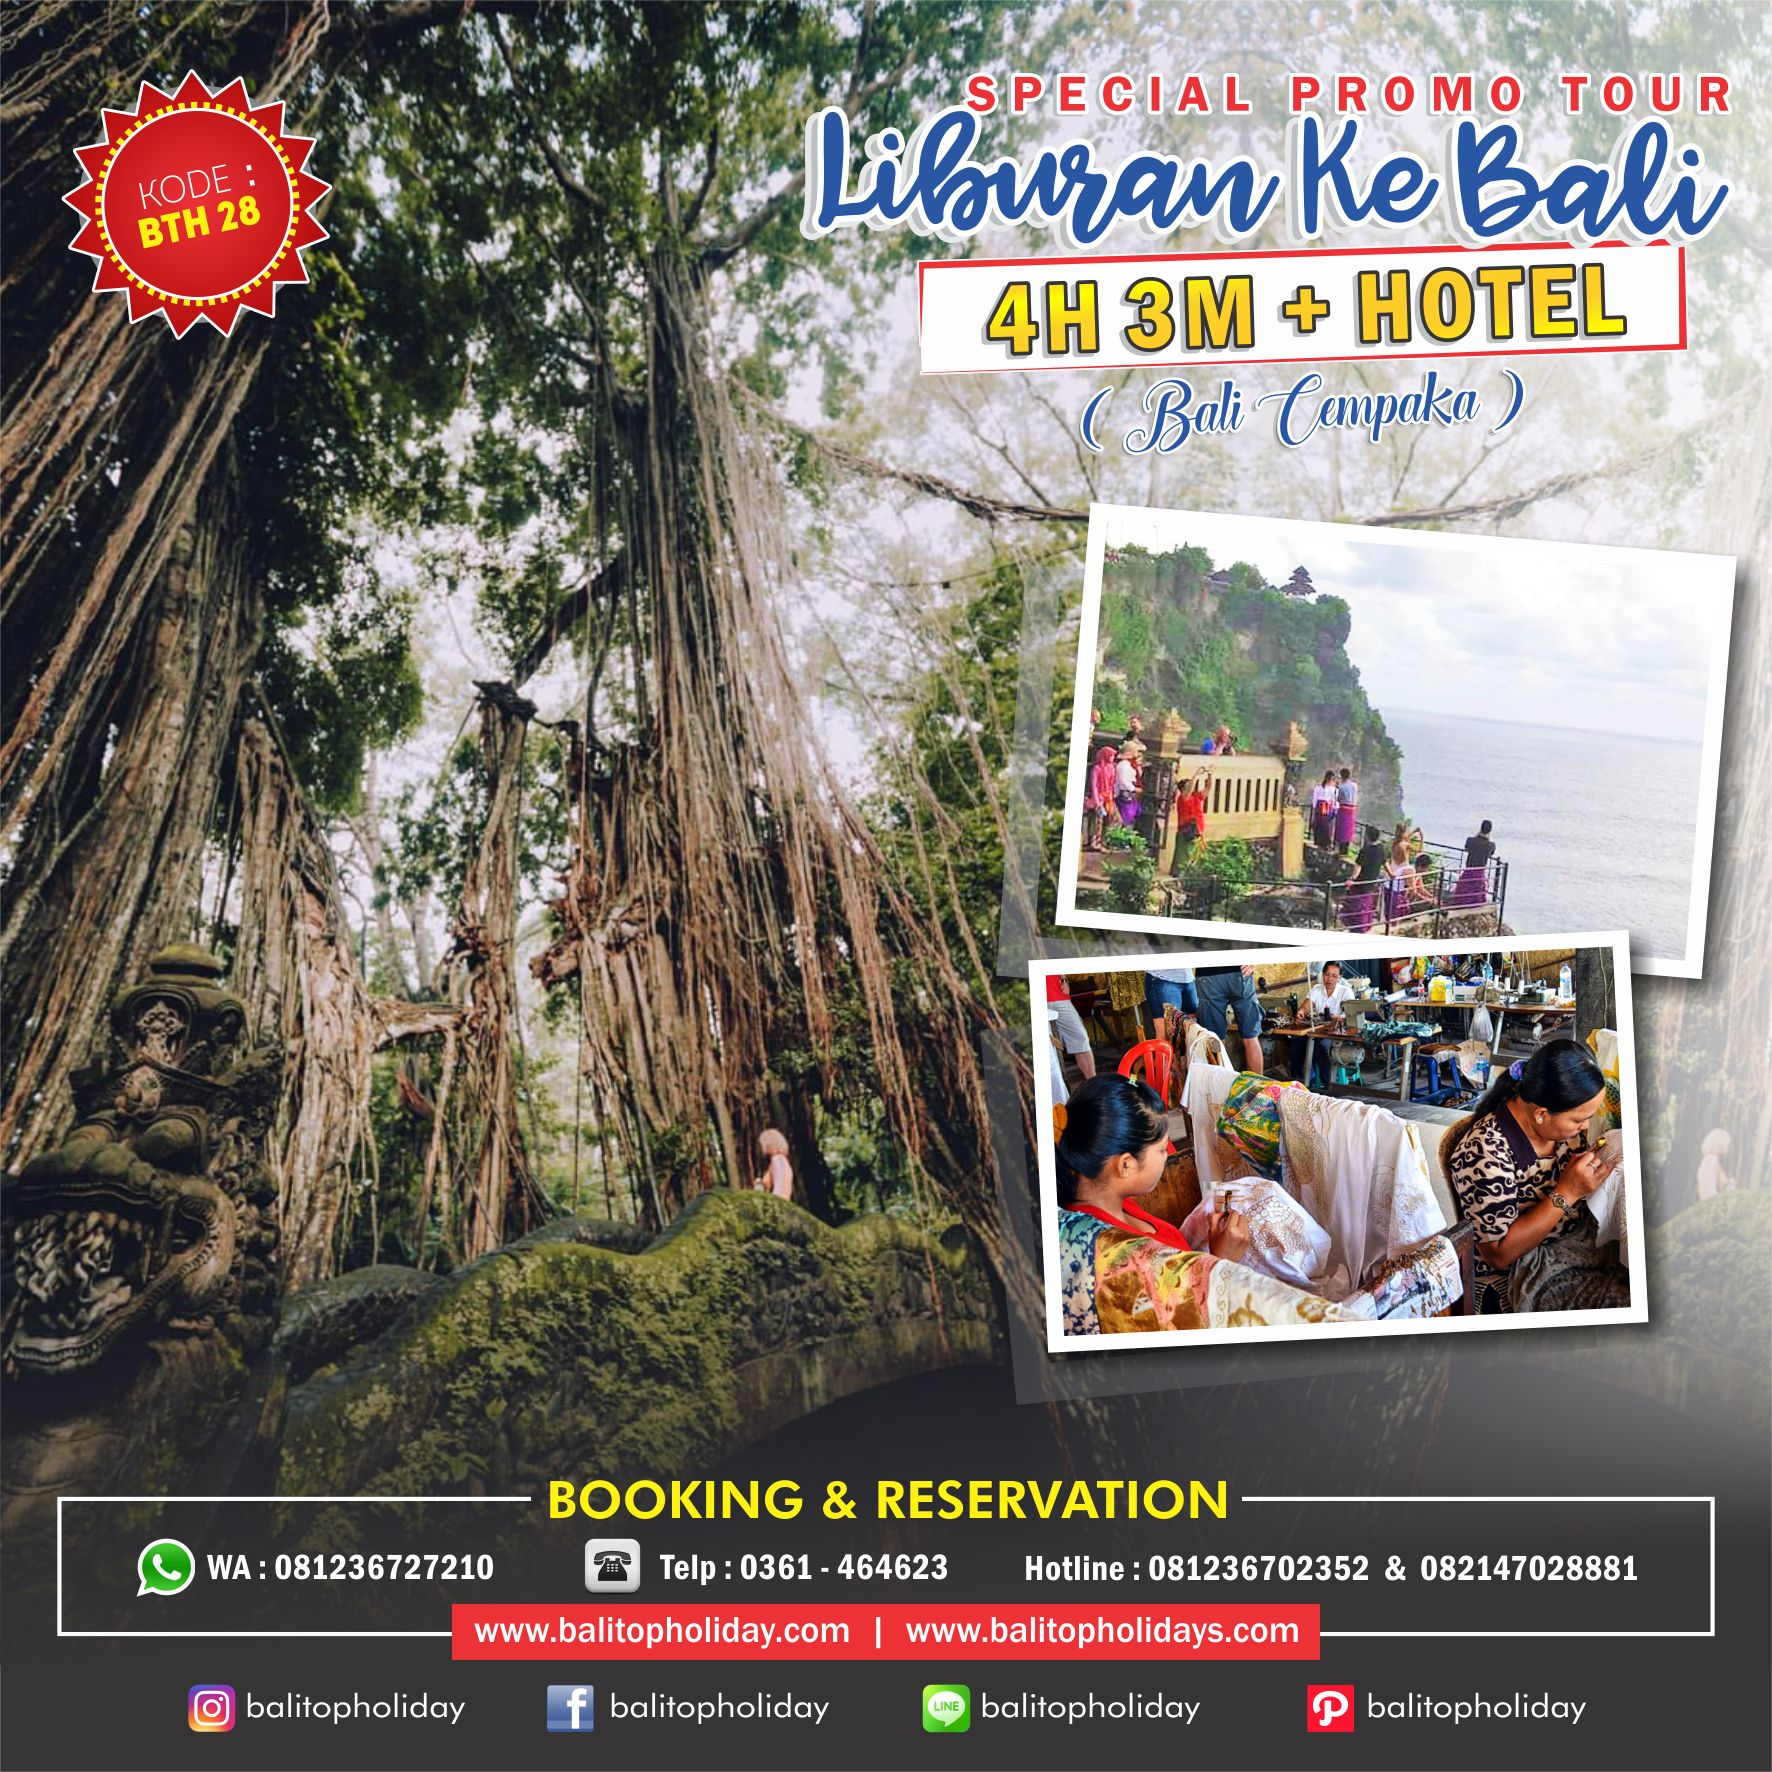 PAKET TOUR 4H 3M BTH 28 Bali Cempaka